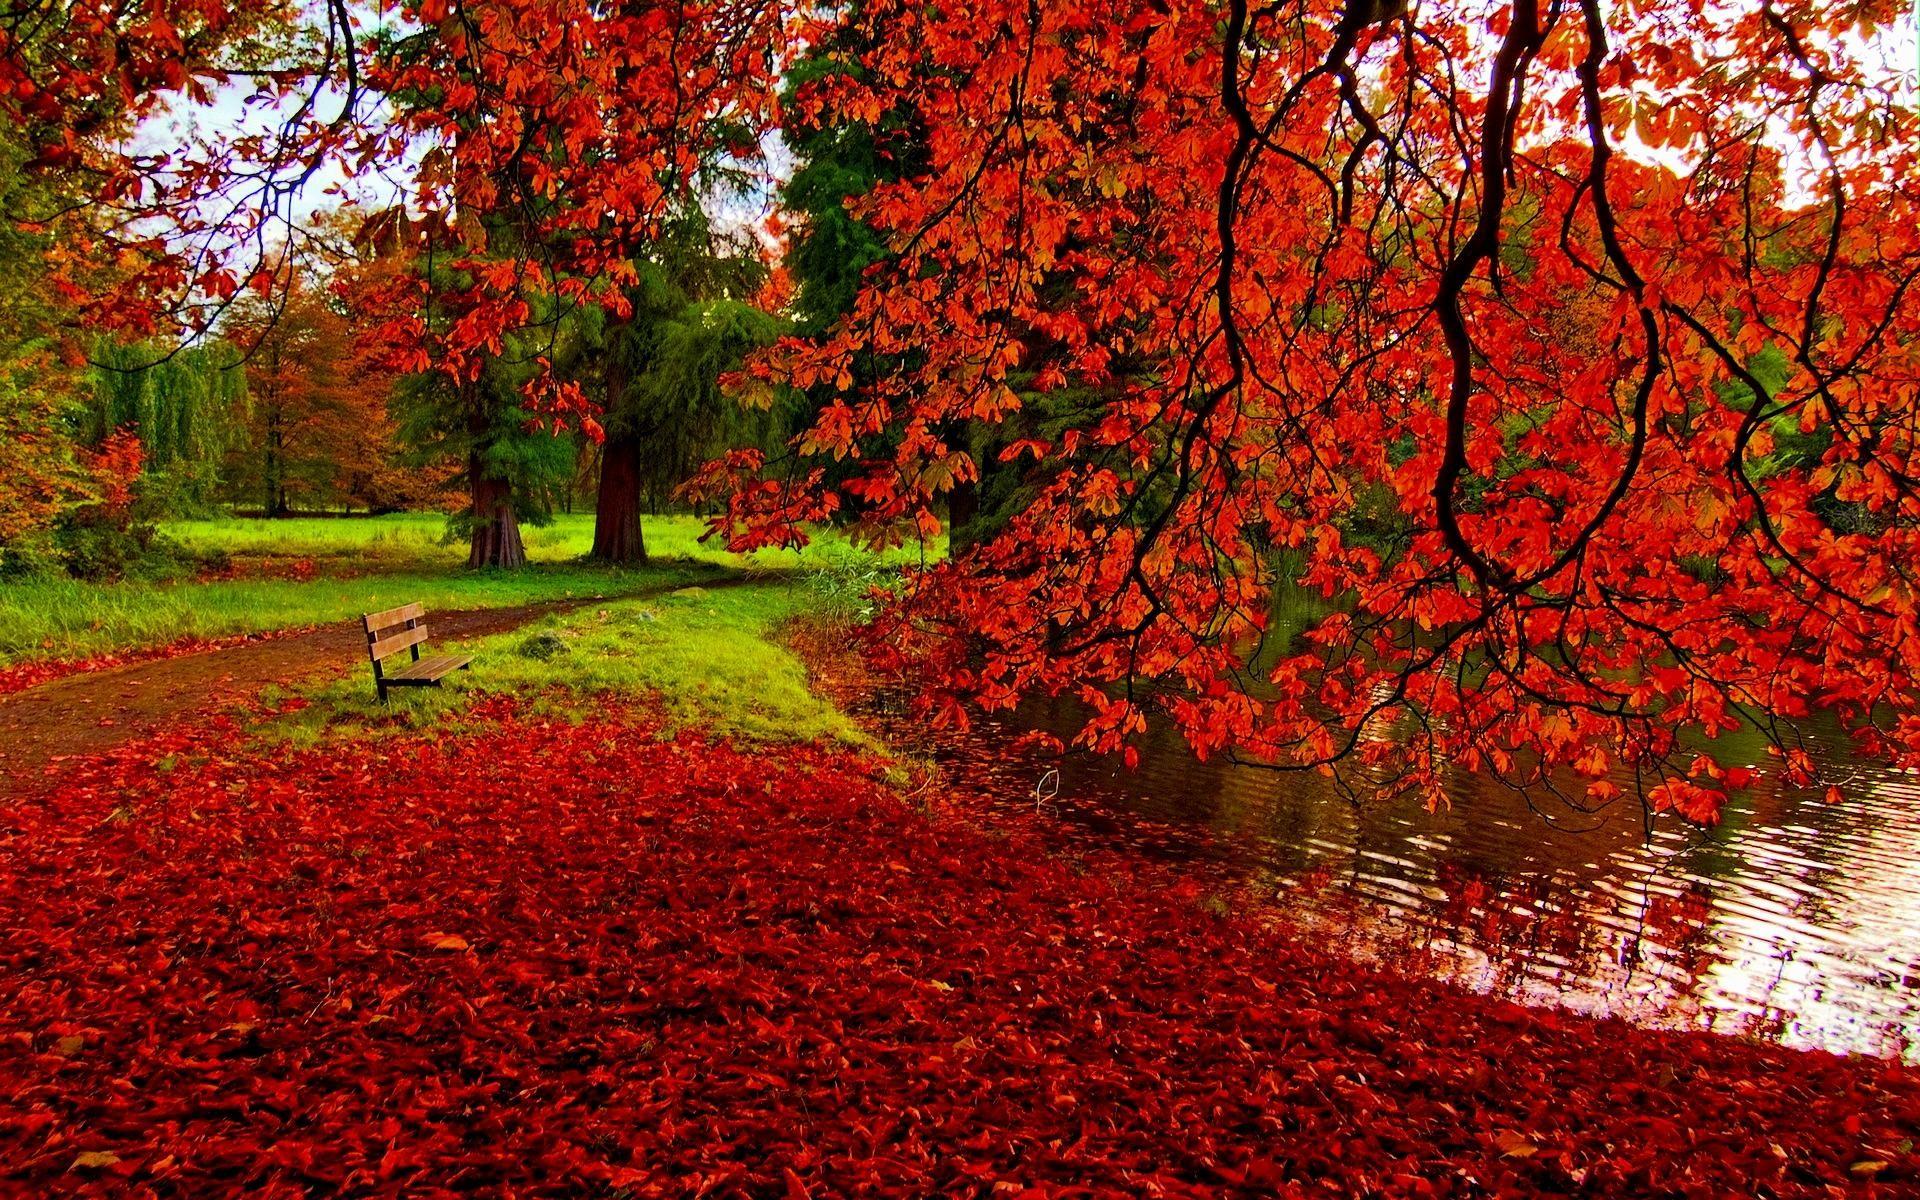 wallpaper.wiki-Fall-Foliage-HD-Wallpaper-PIC-WPE008820